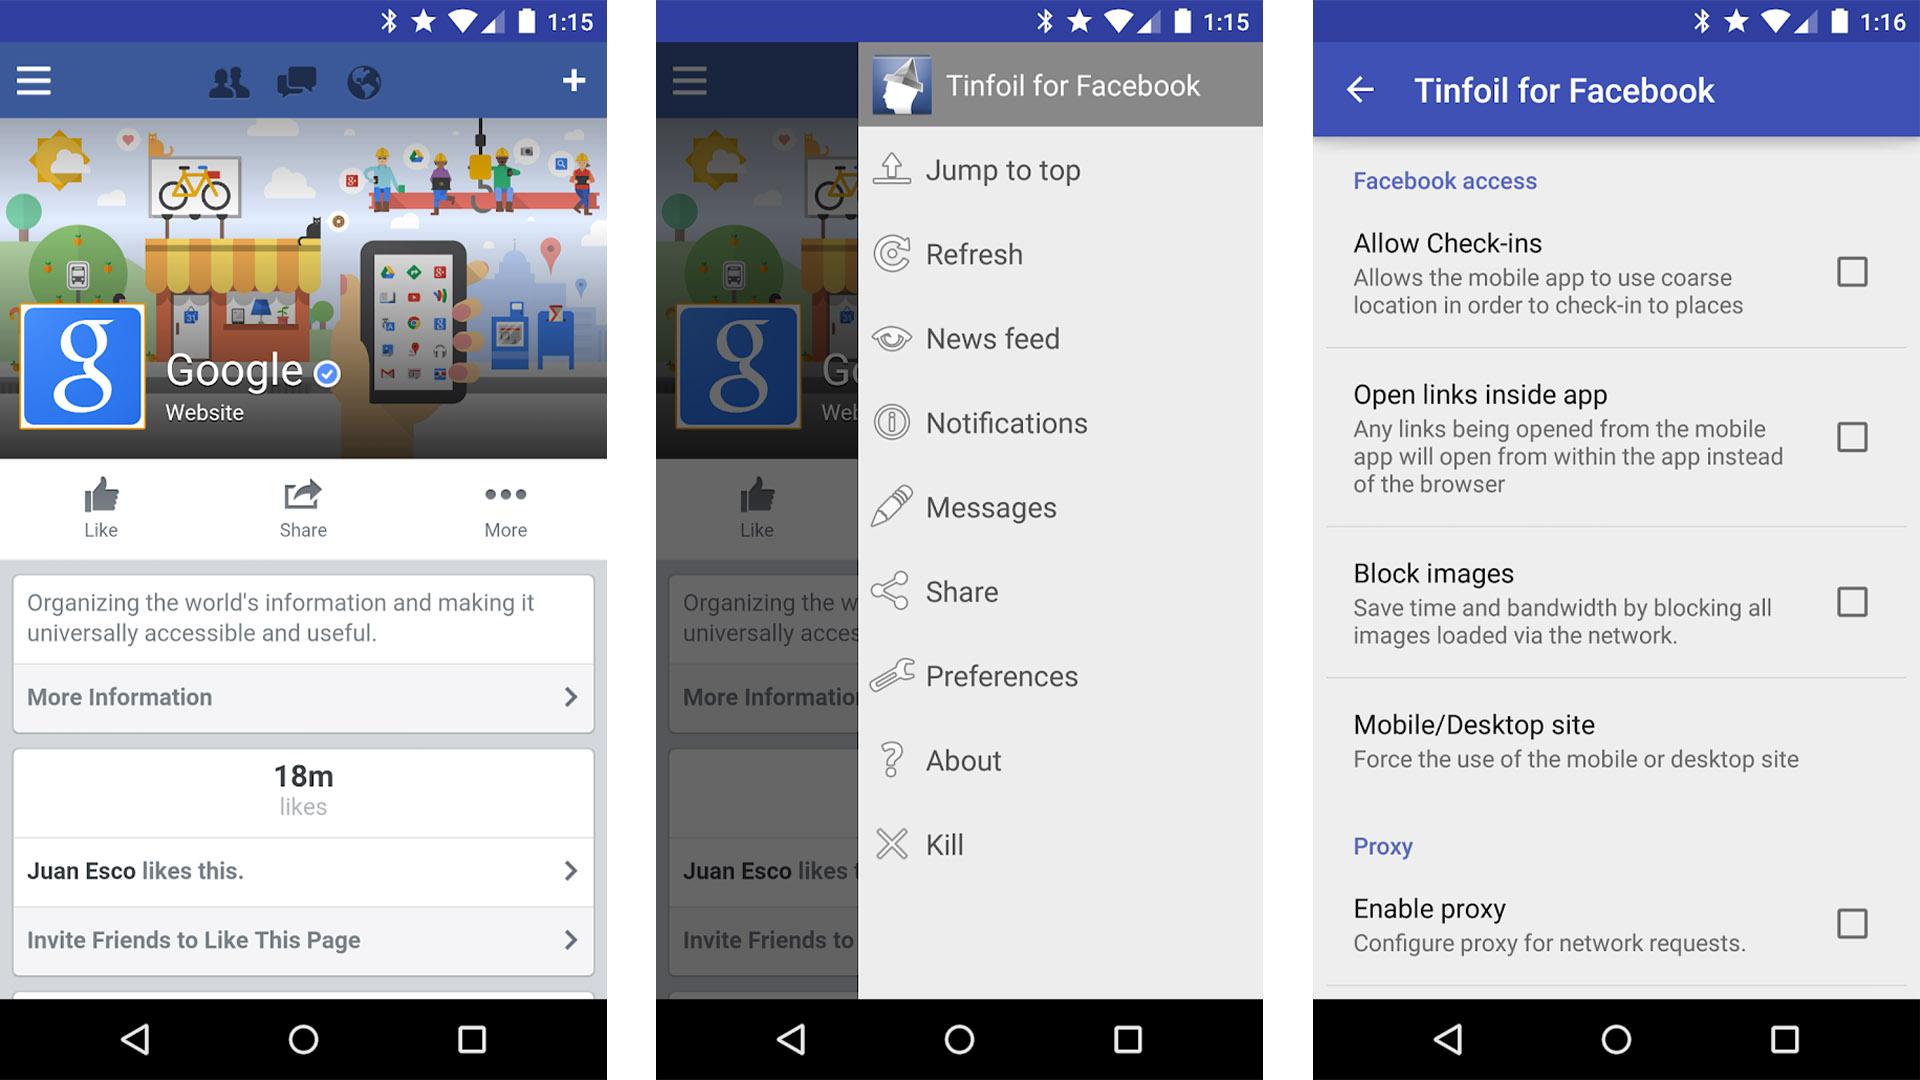 Tinfoil for Facebook screenshot 2020